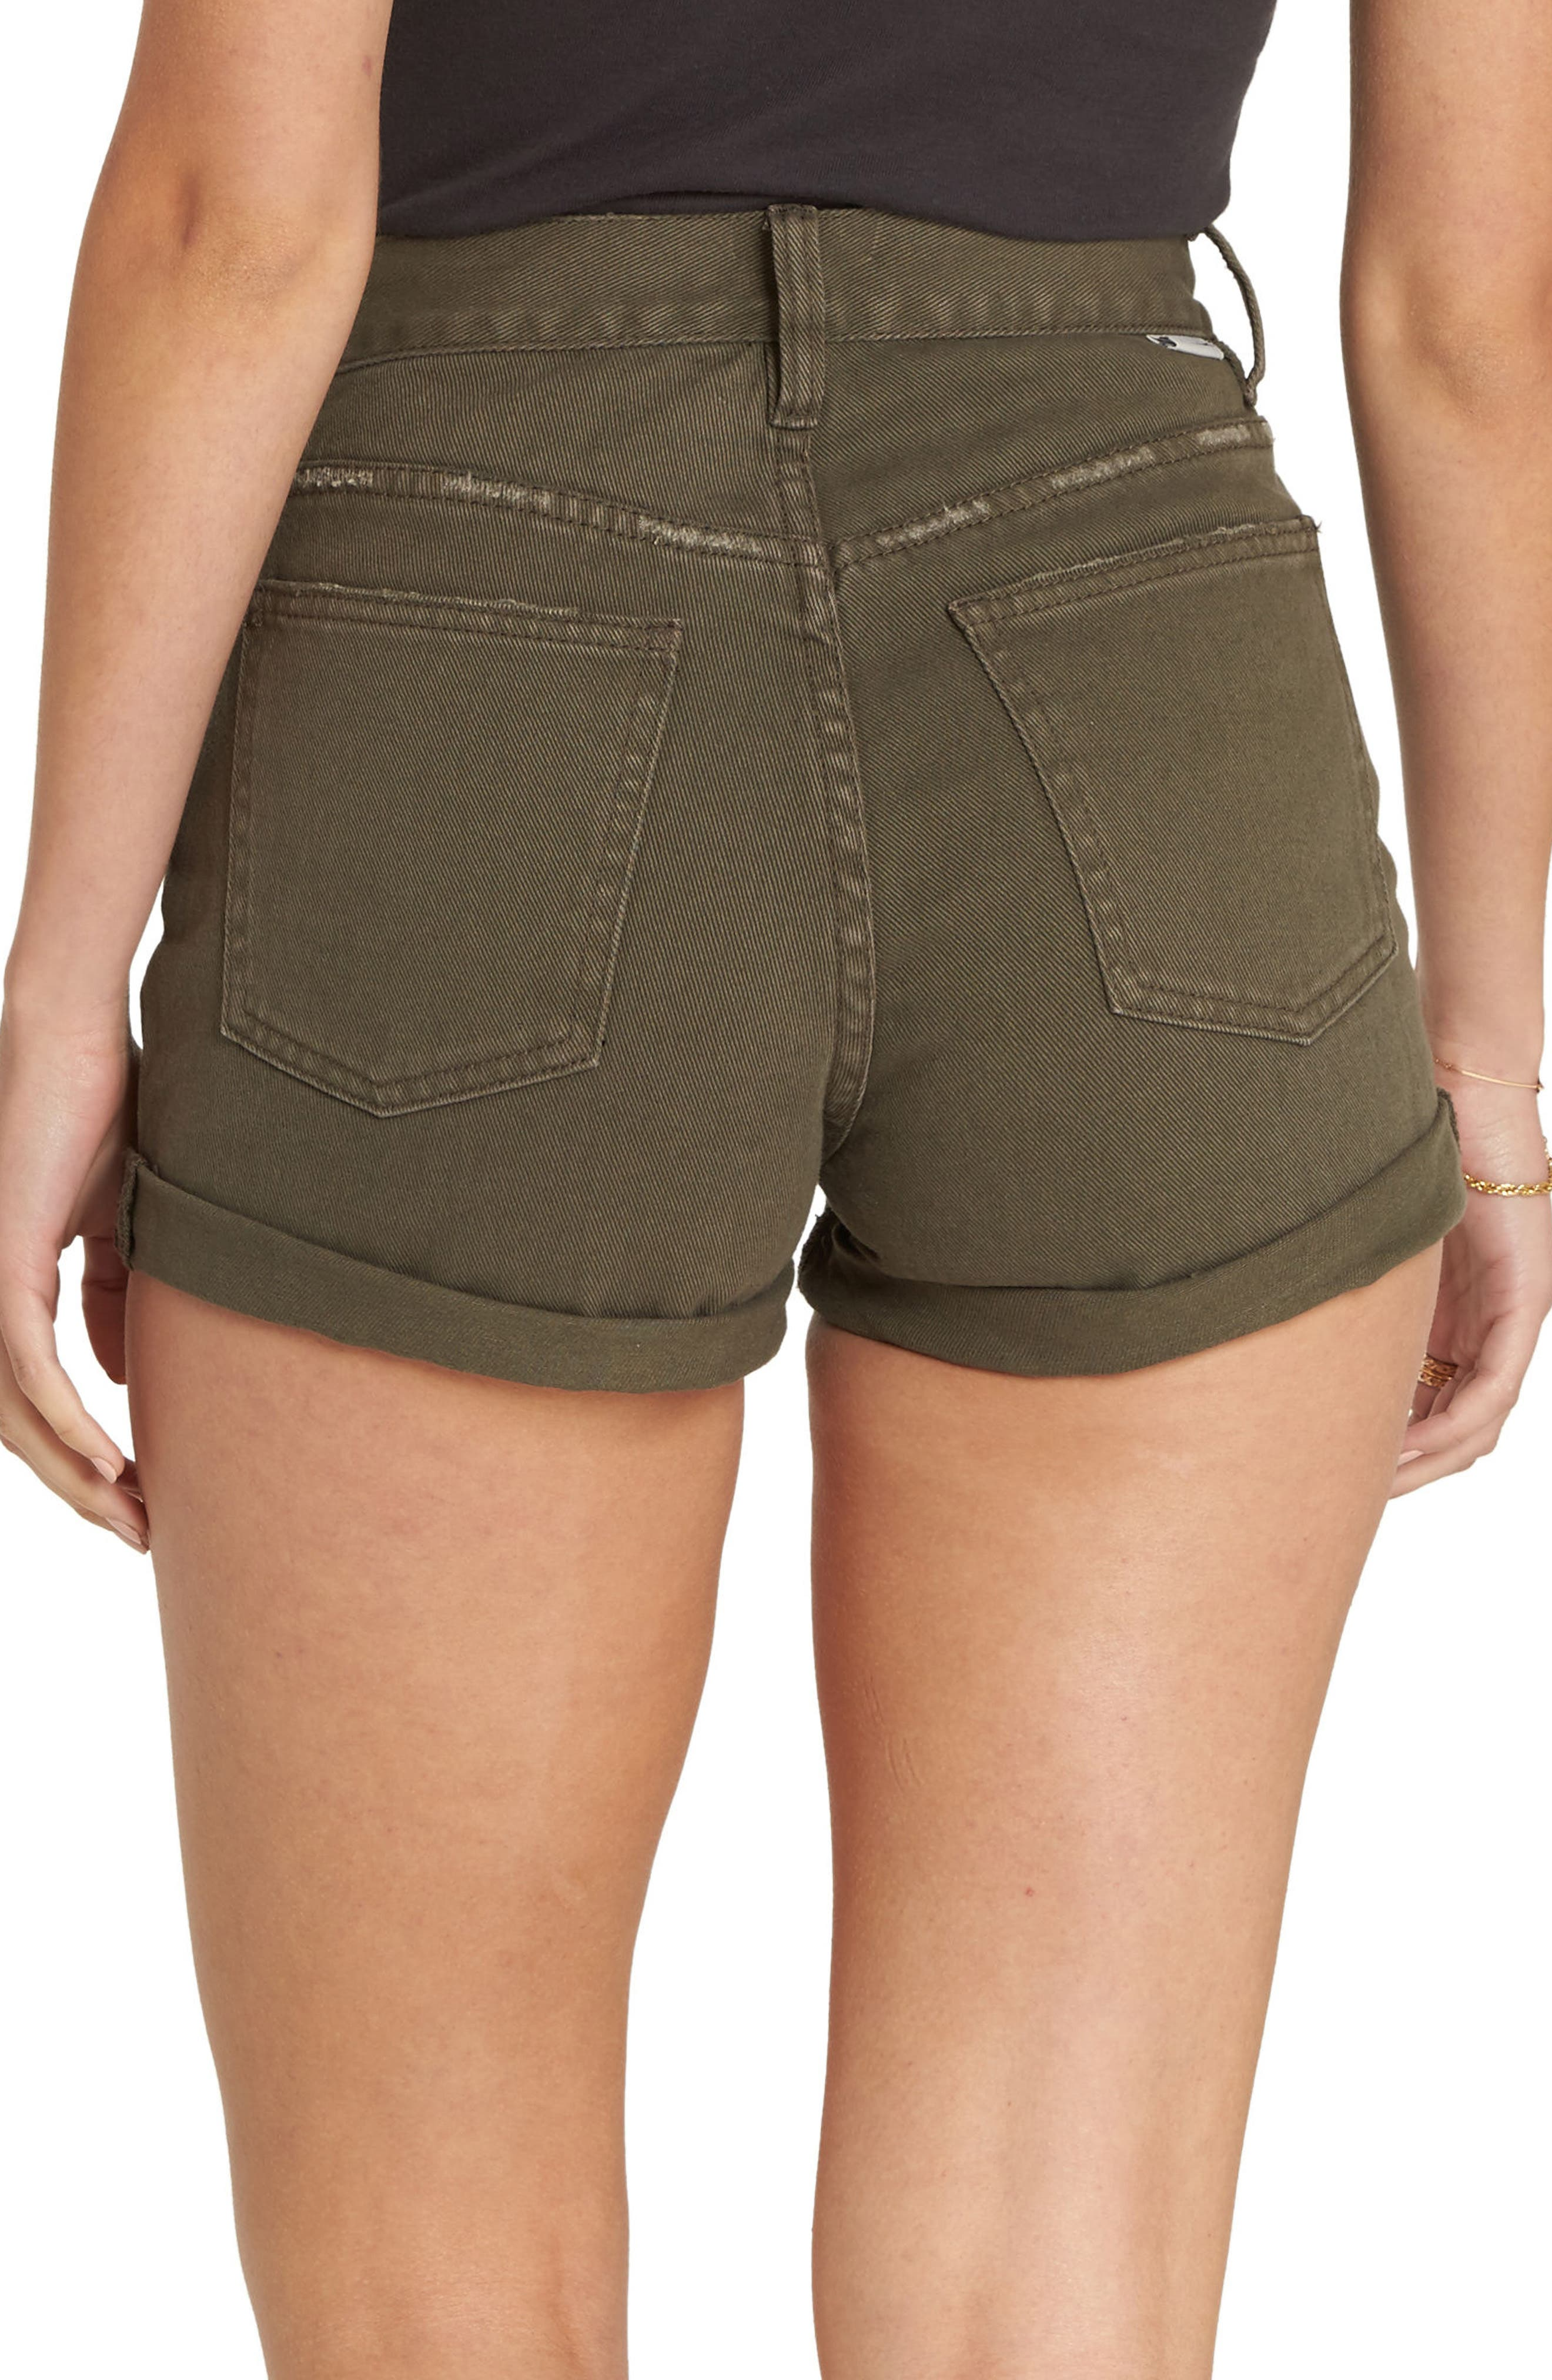 High Tide Denim Shorts,                             Alternate thumbnail 2, color,                             Olive